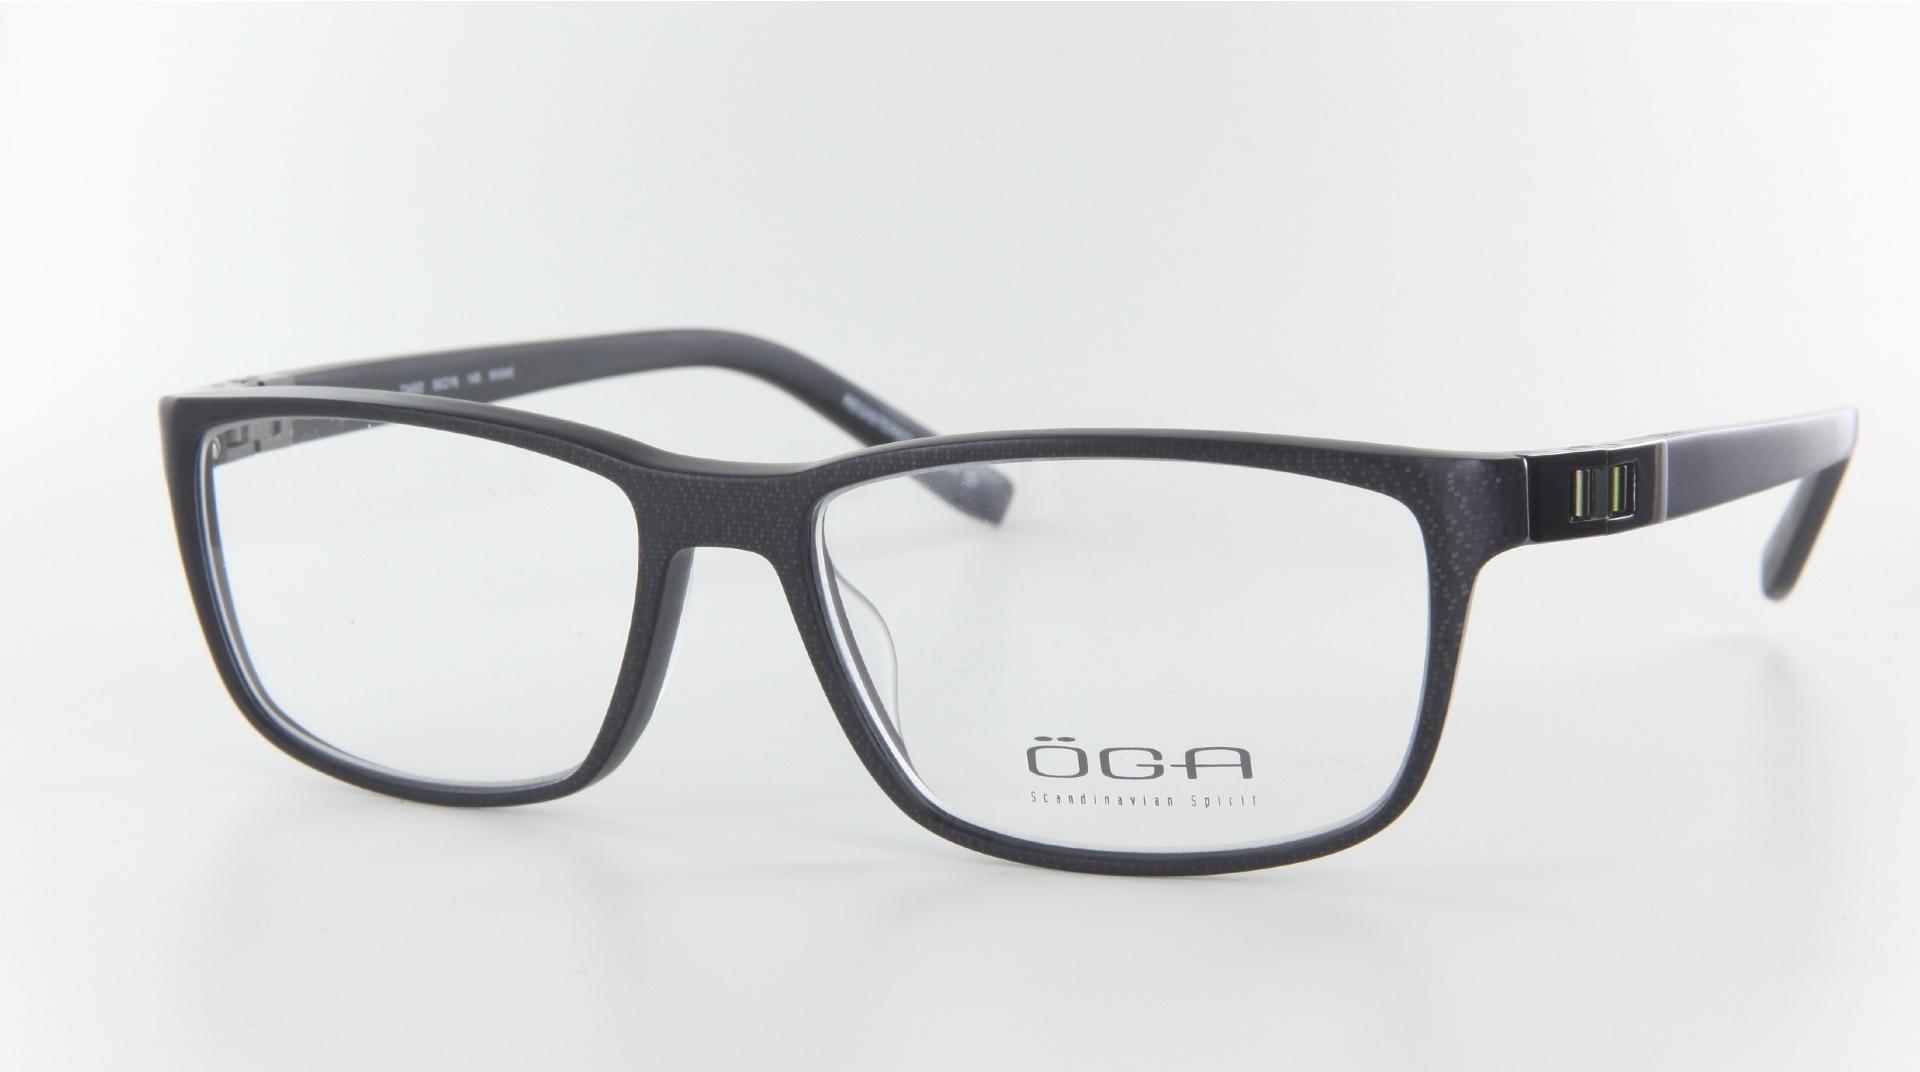 OGA - ref: 70575